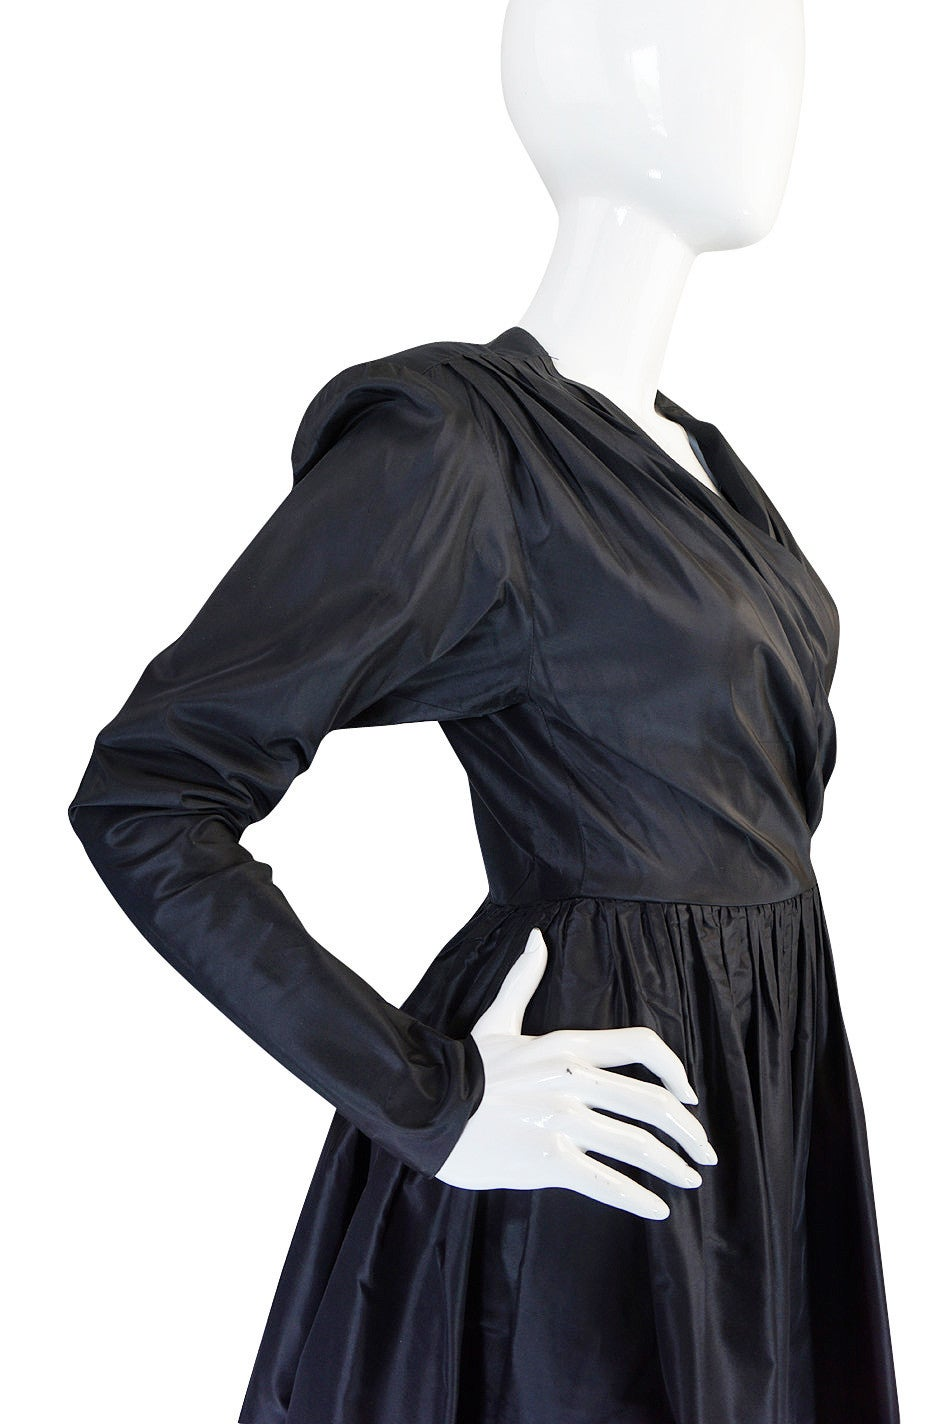 Exceptional 1970s Yves Saint Laurent Black Silk Dress 6